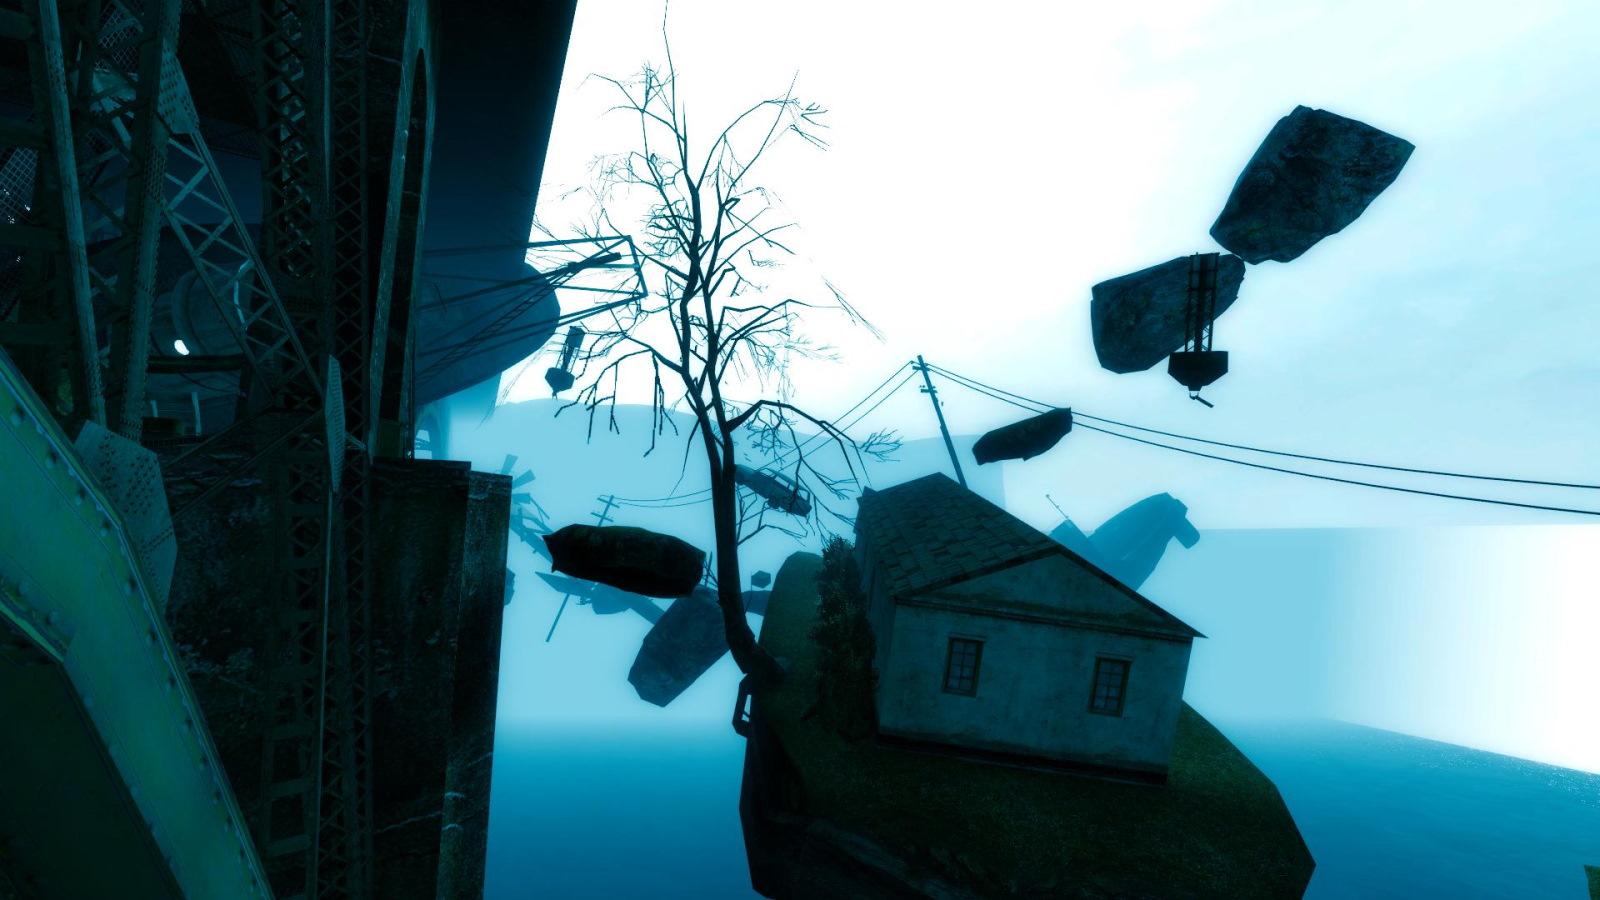 Take a whirlwind tour through Half-Life 2 in this abridged